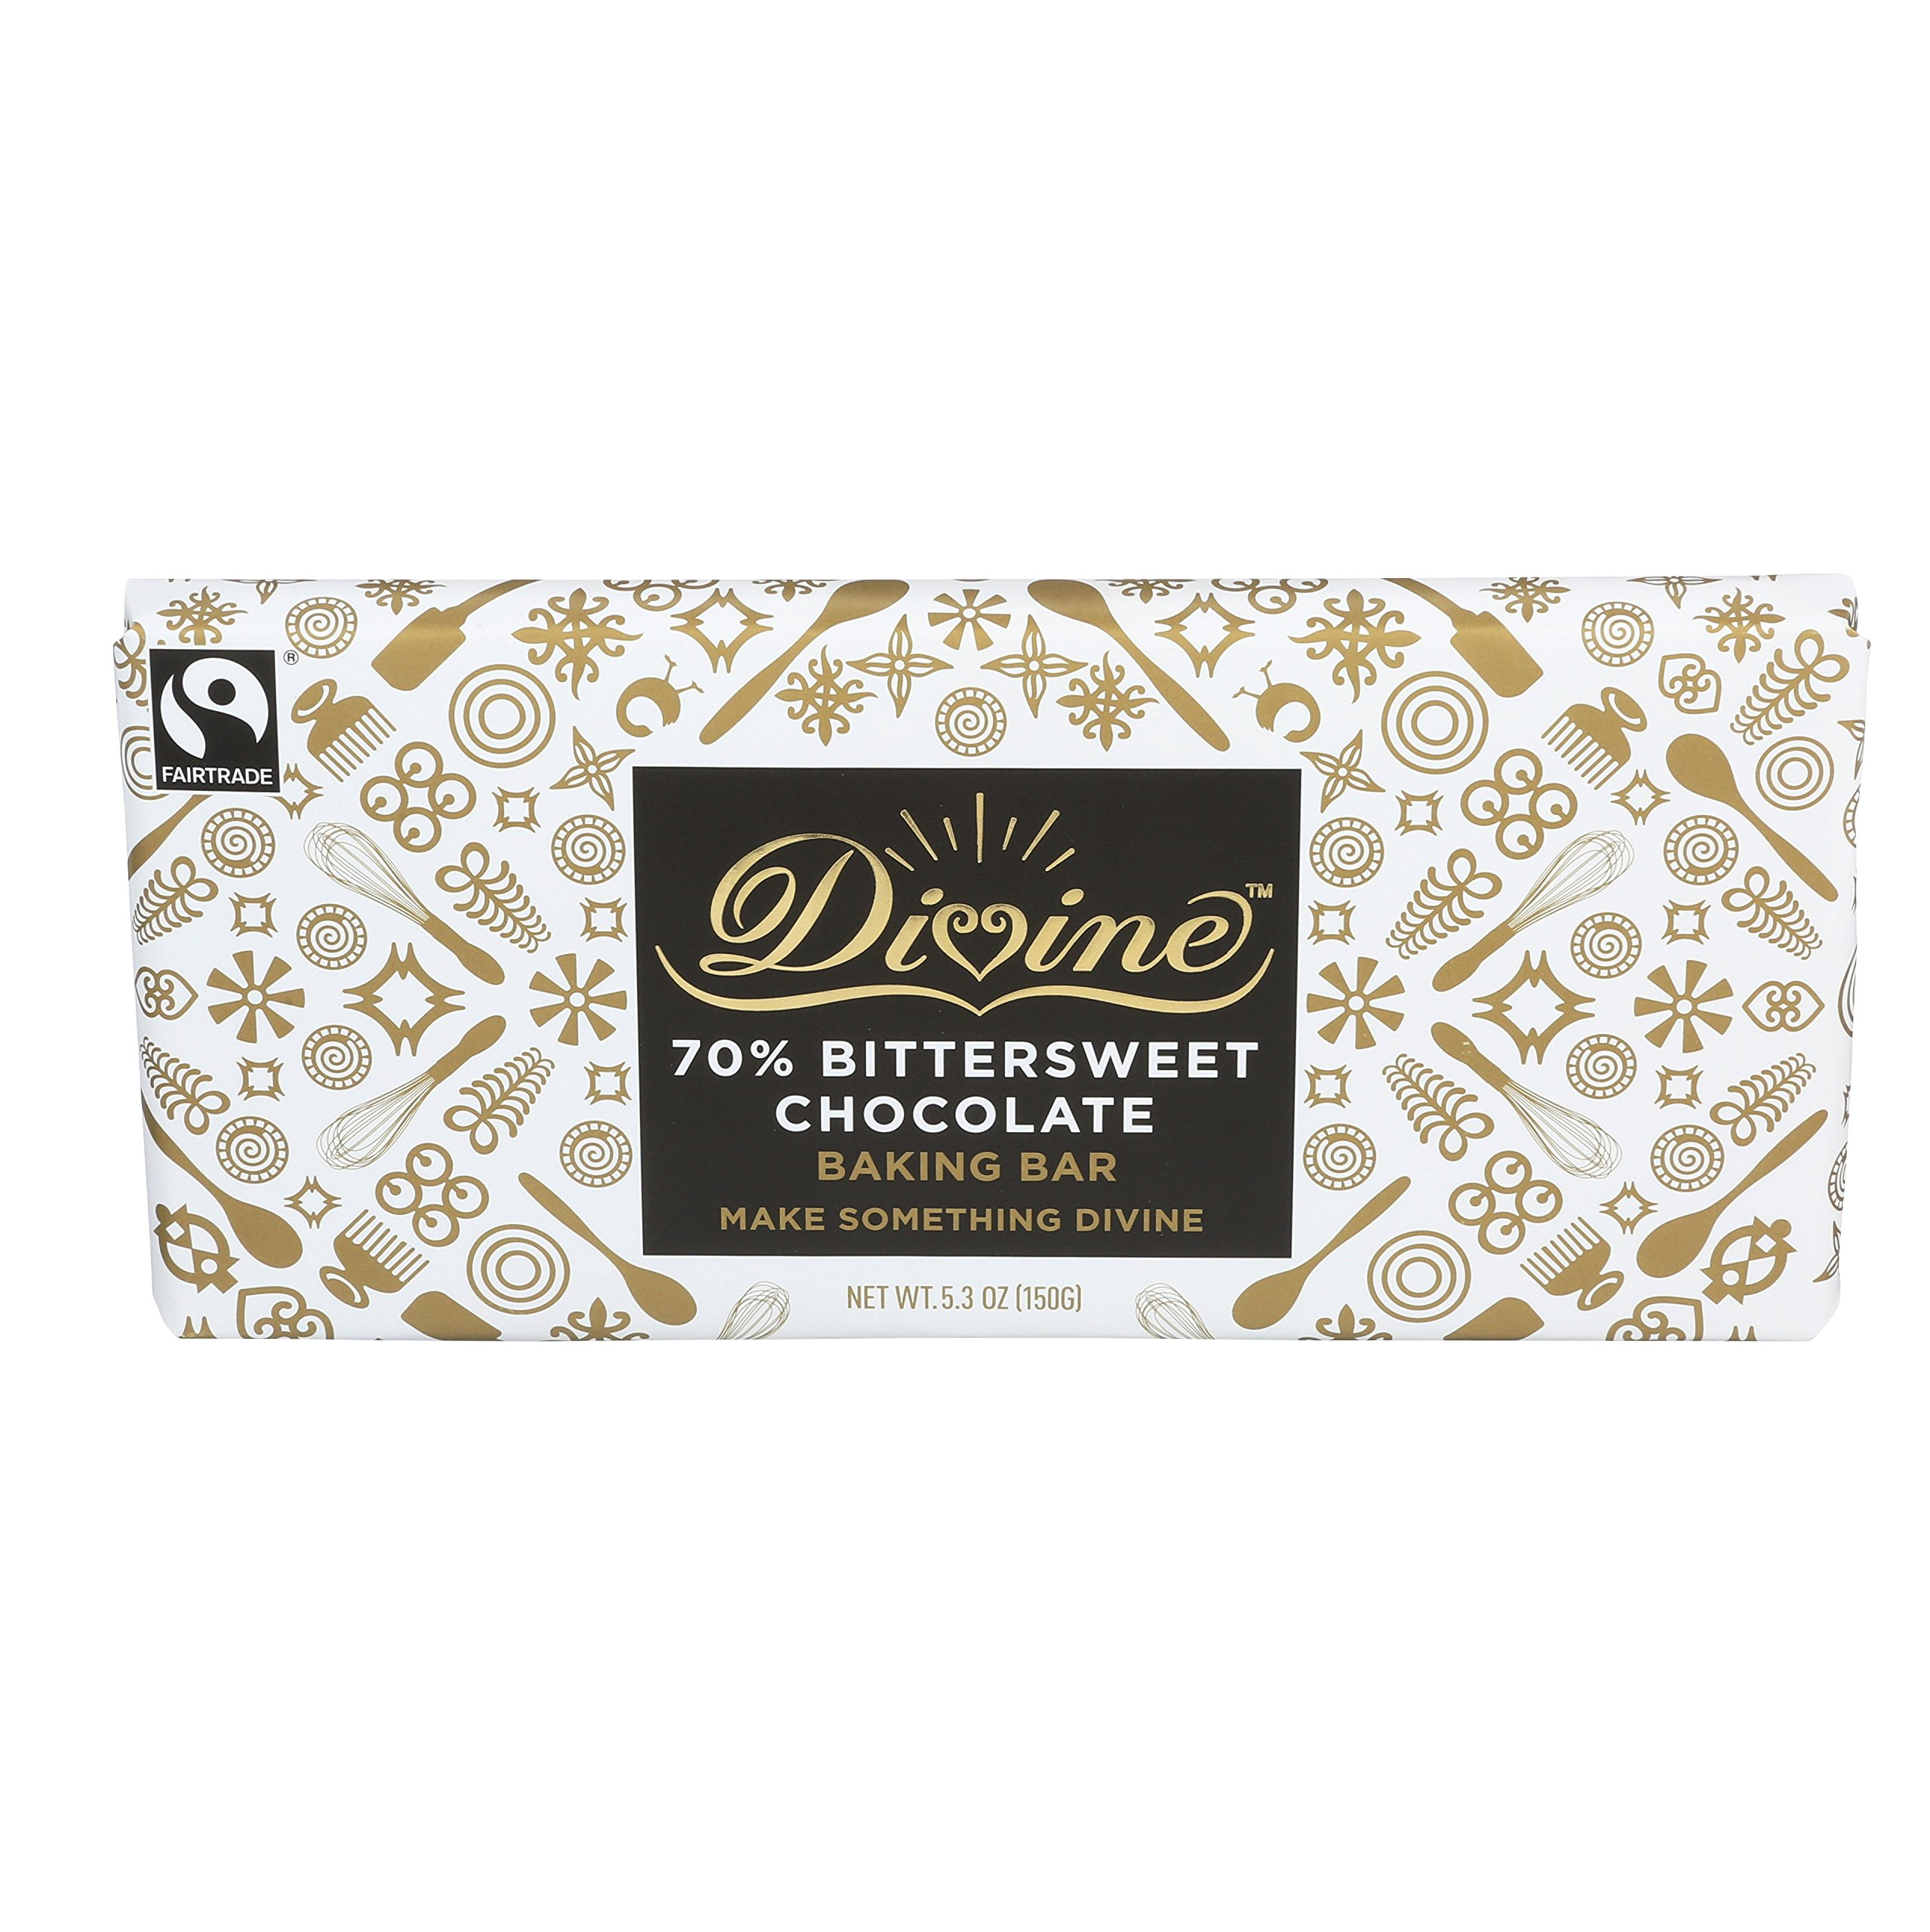 Divine Chocolate 70% Bittersweet Chocolate Baking Bar, 5.3 Ounce